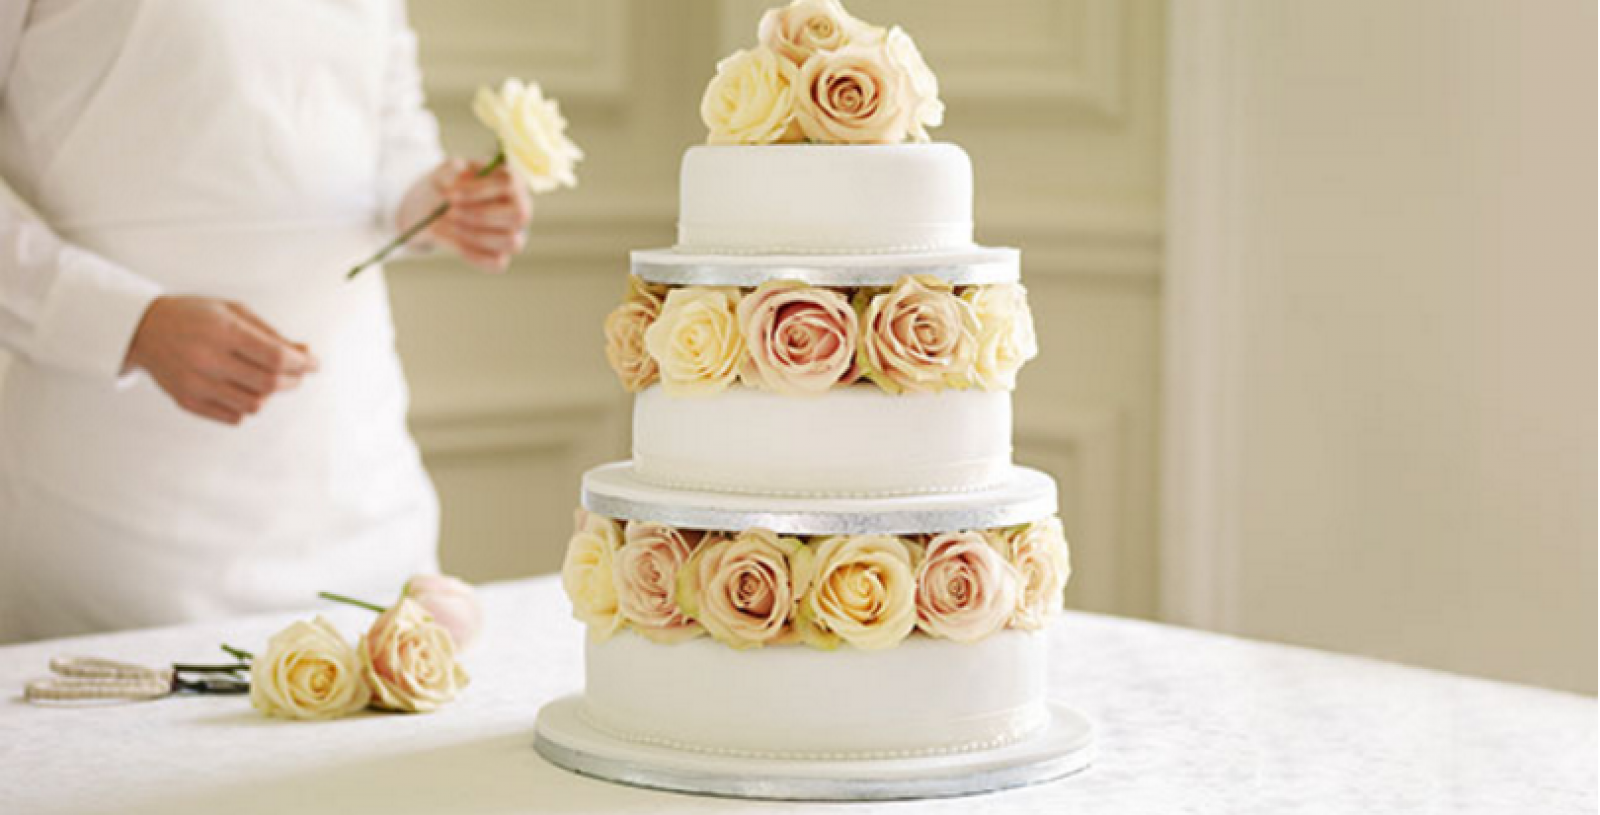 Easy Diy Wedding Cakes With Waitrose Weddingplanner